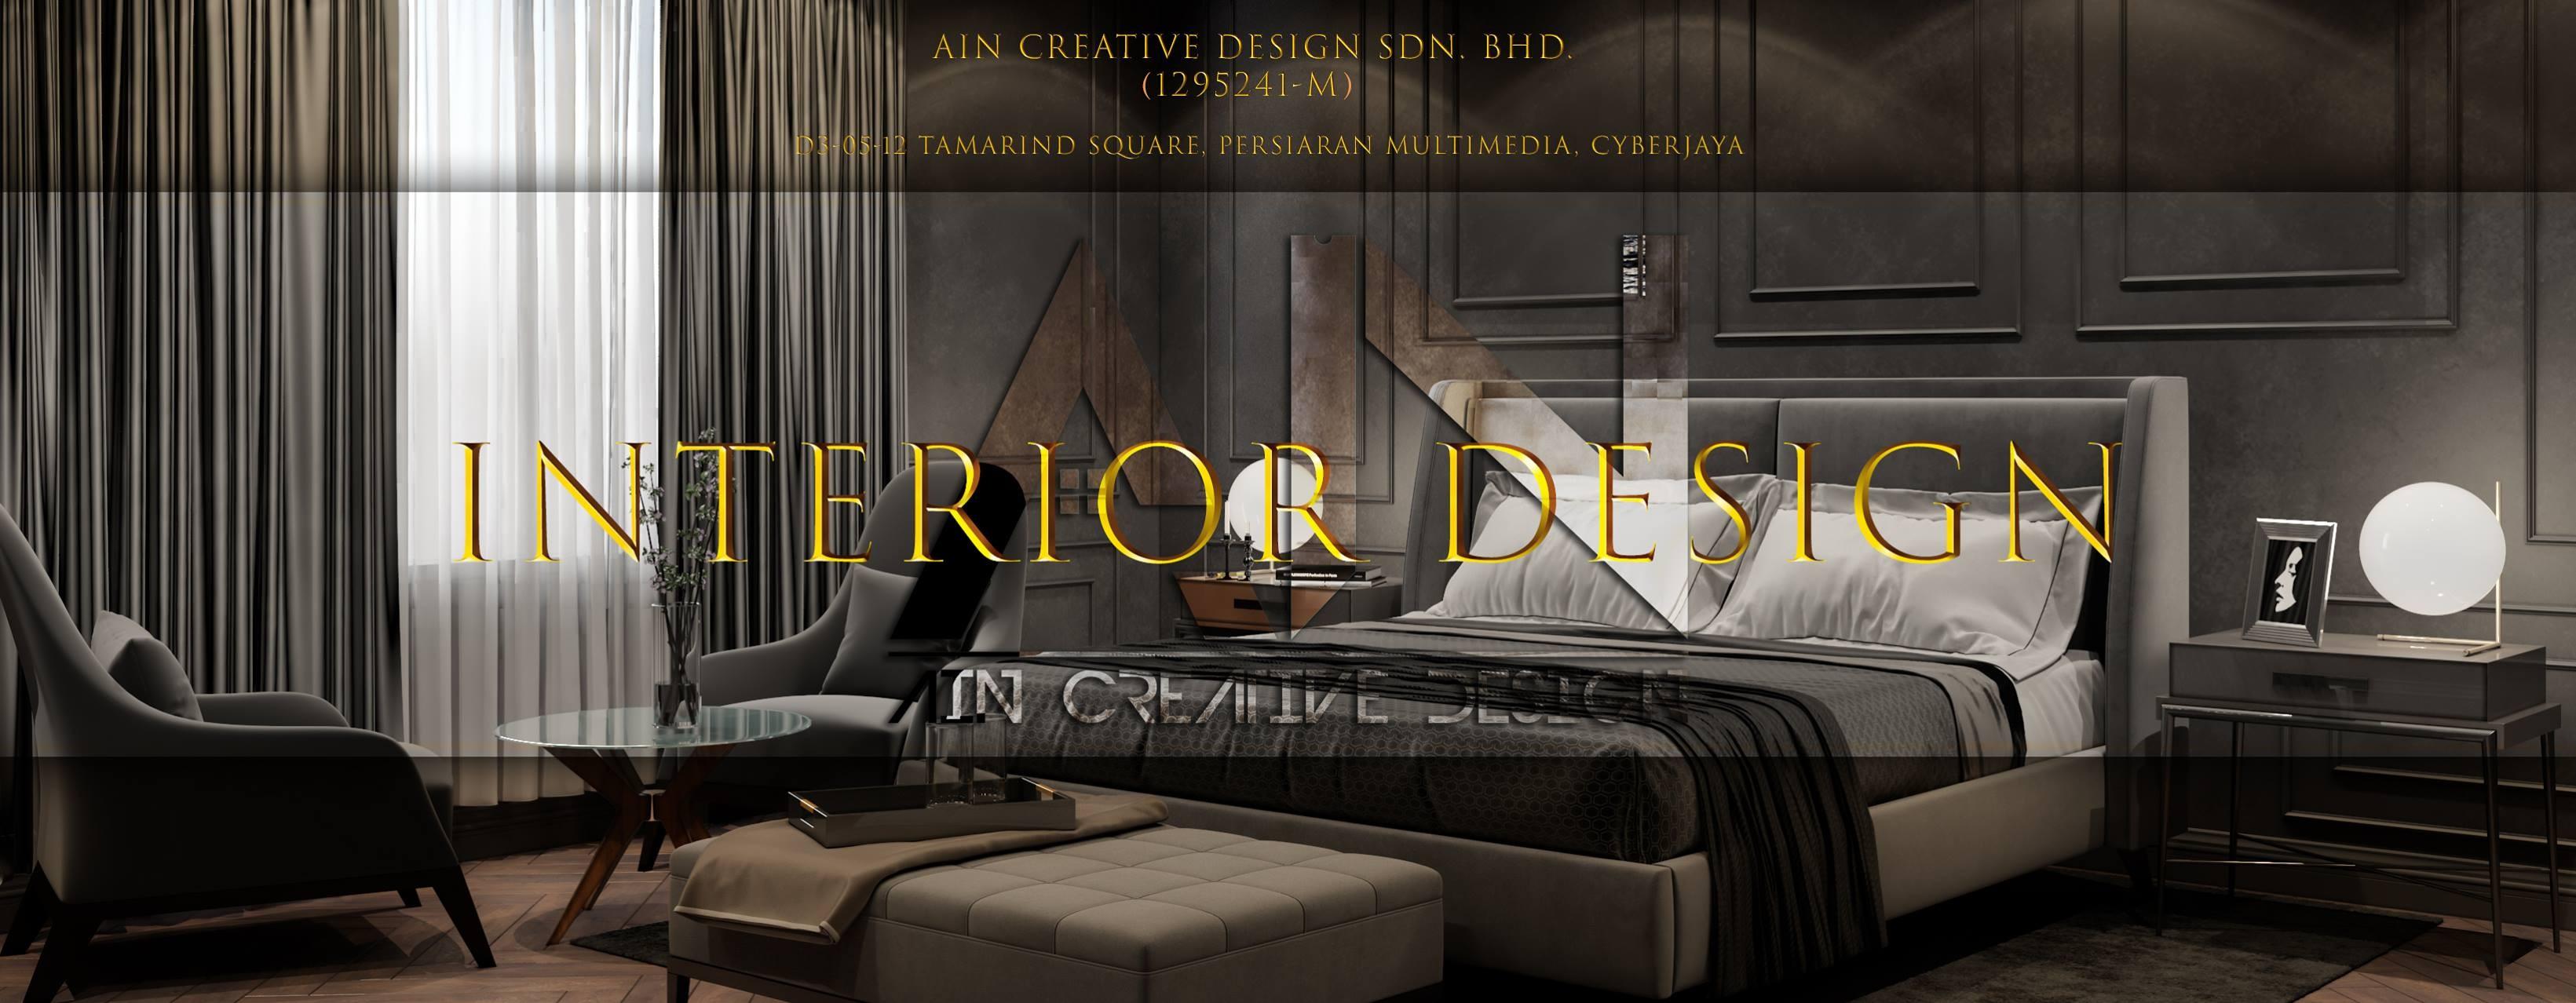 Ain Creative Design Sdn Bhd Linkedin